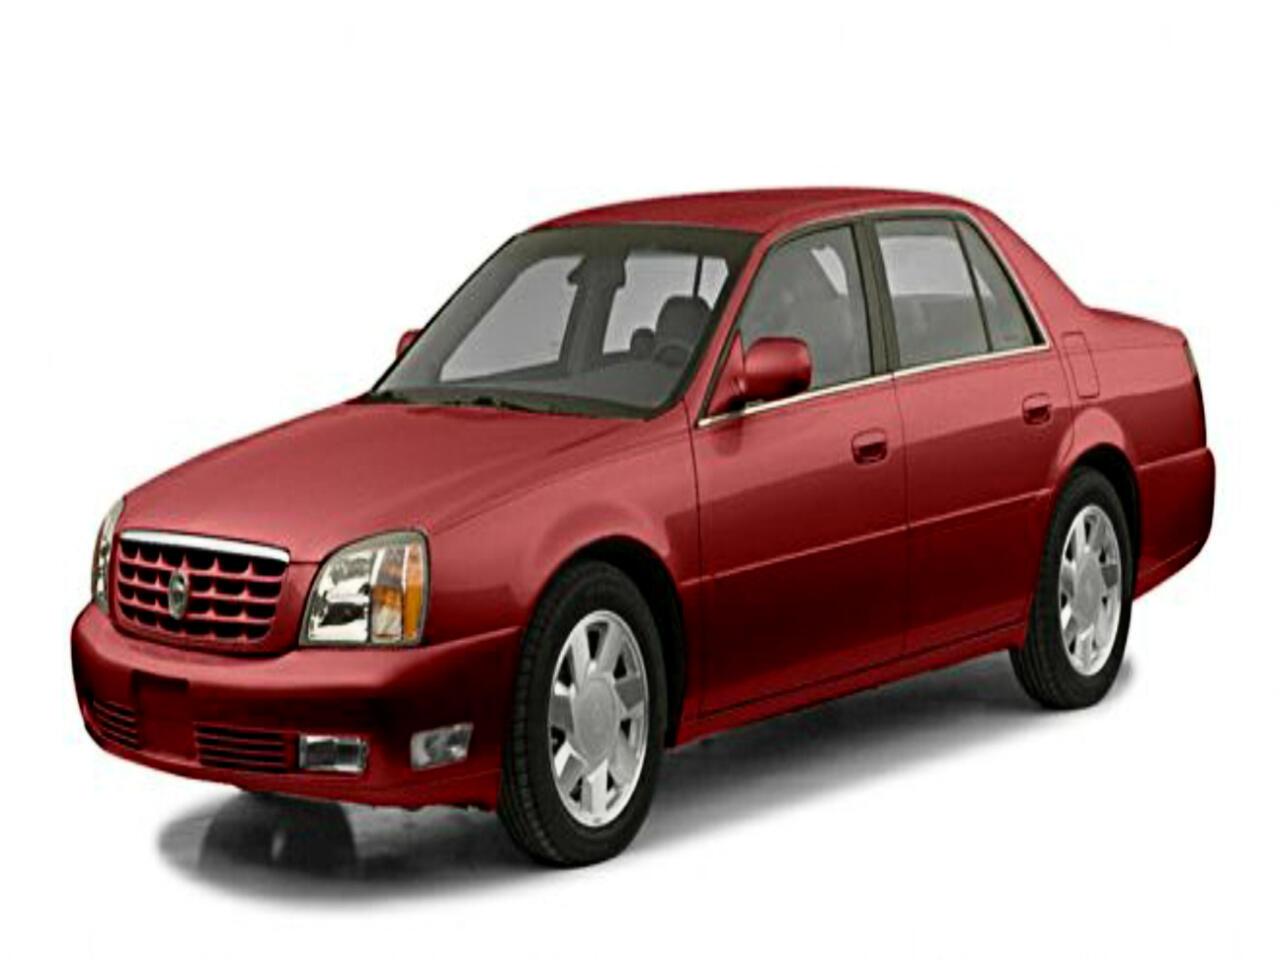 Cadillac DeVille 4dr Sdn 2002